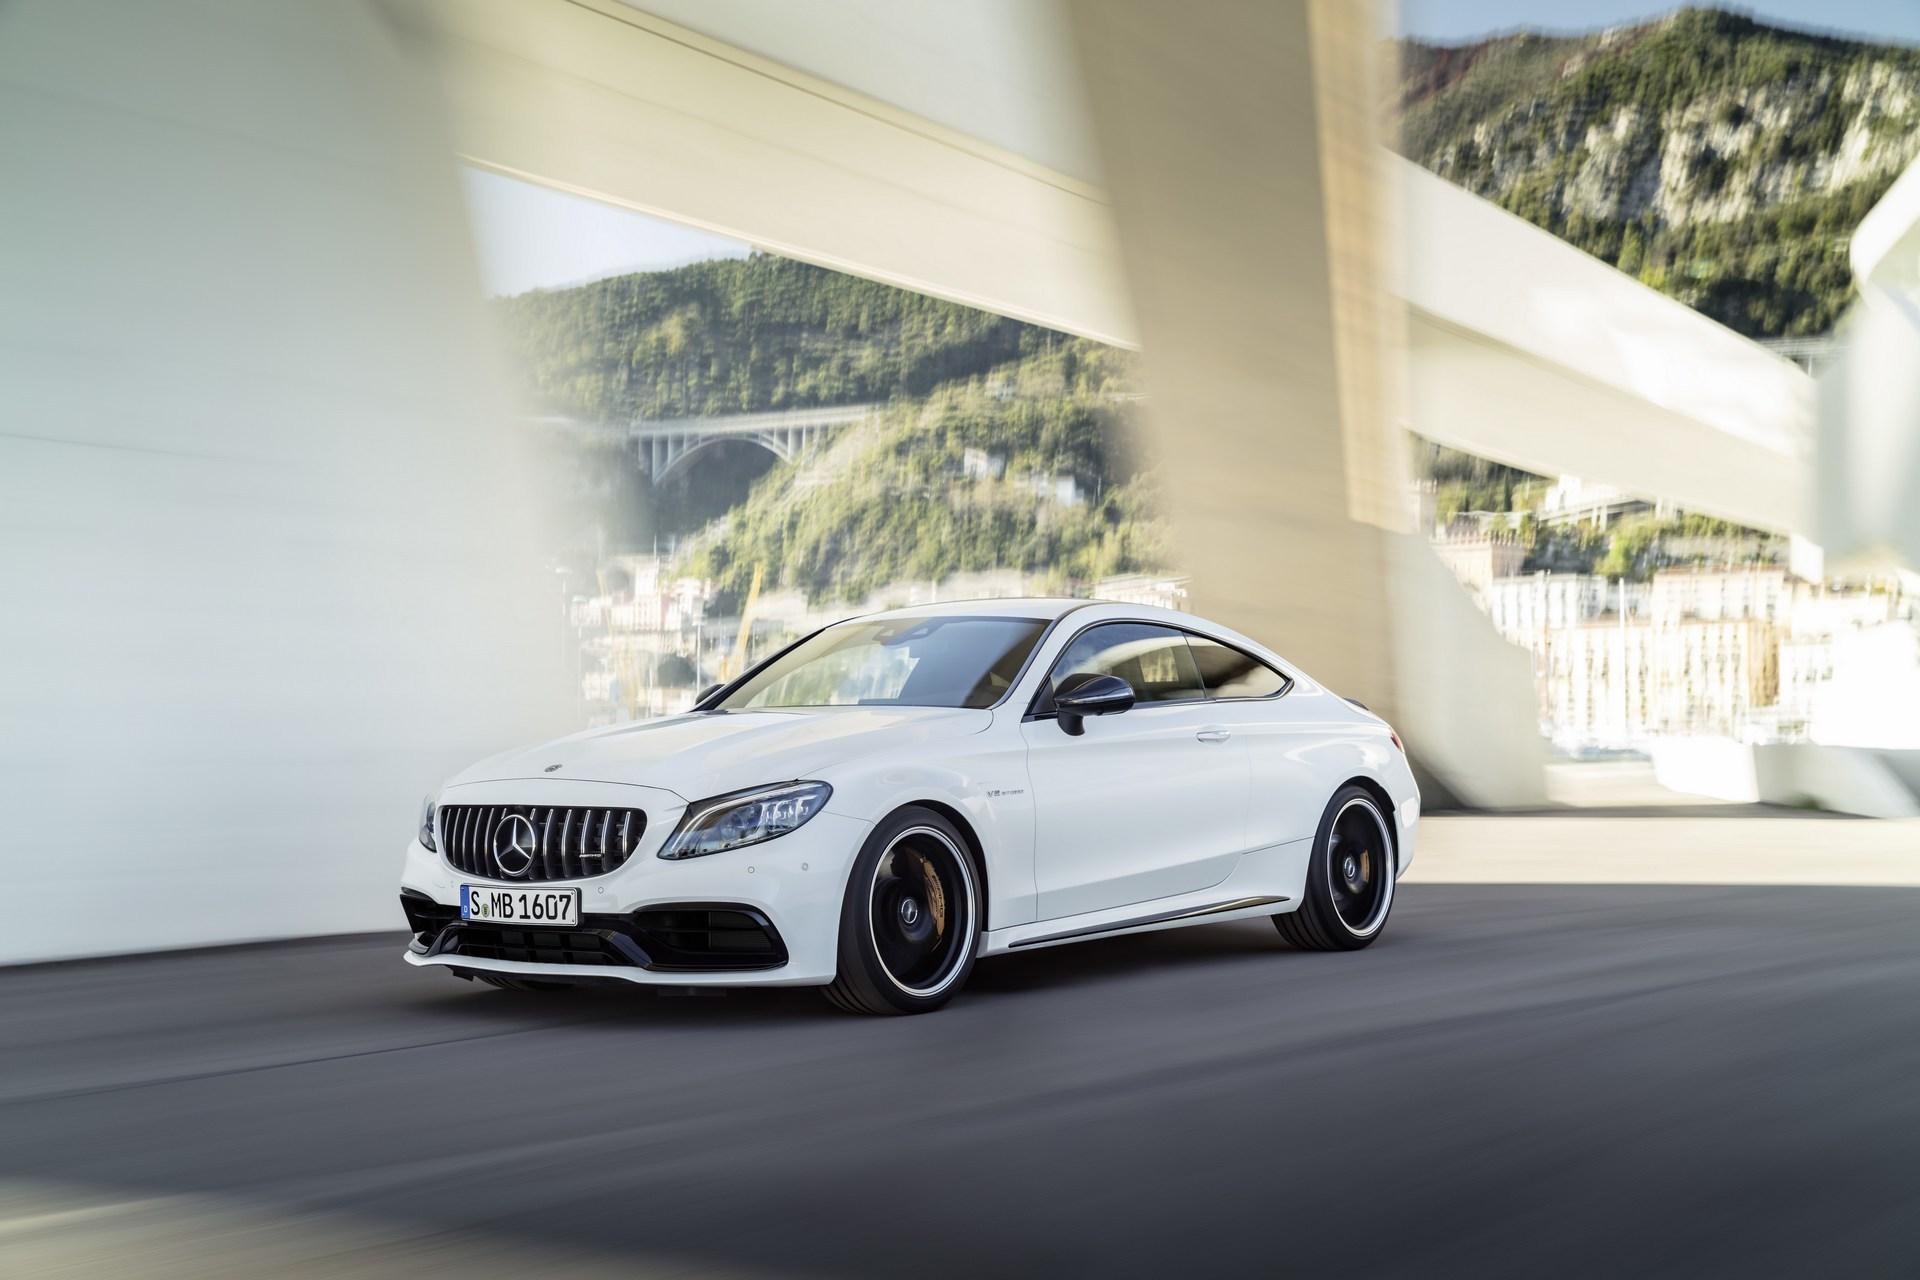 Mercedes-AMG-C63-Coupe-2.jpg